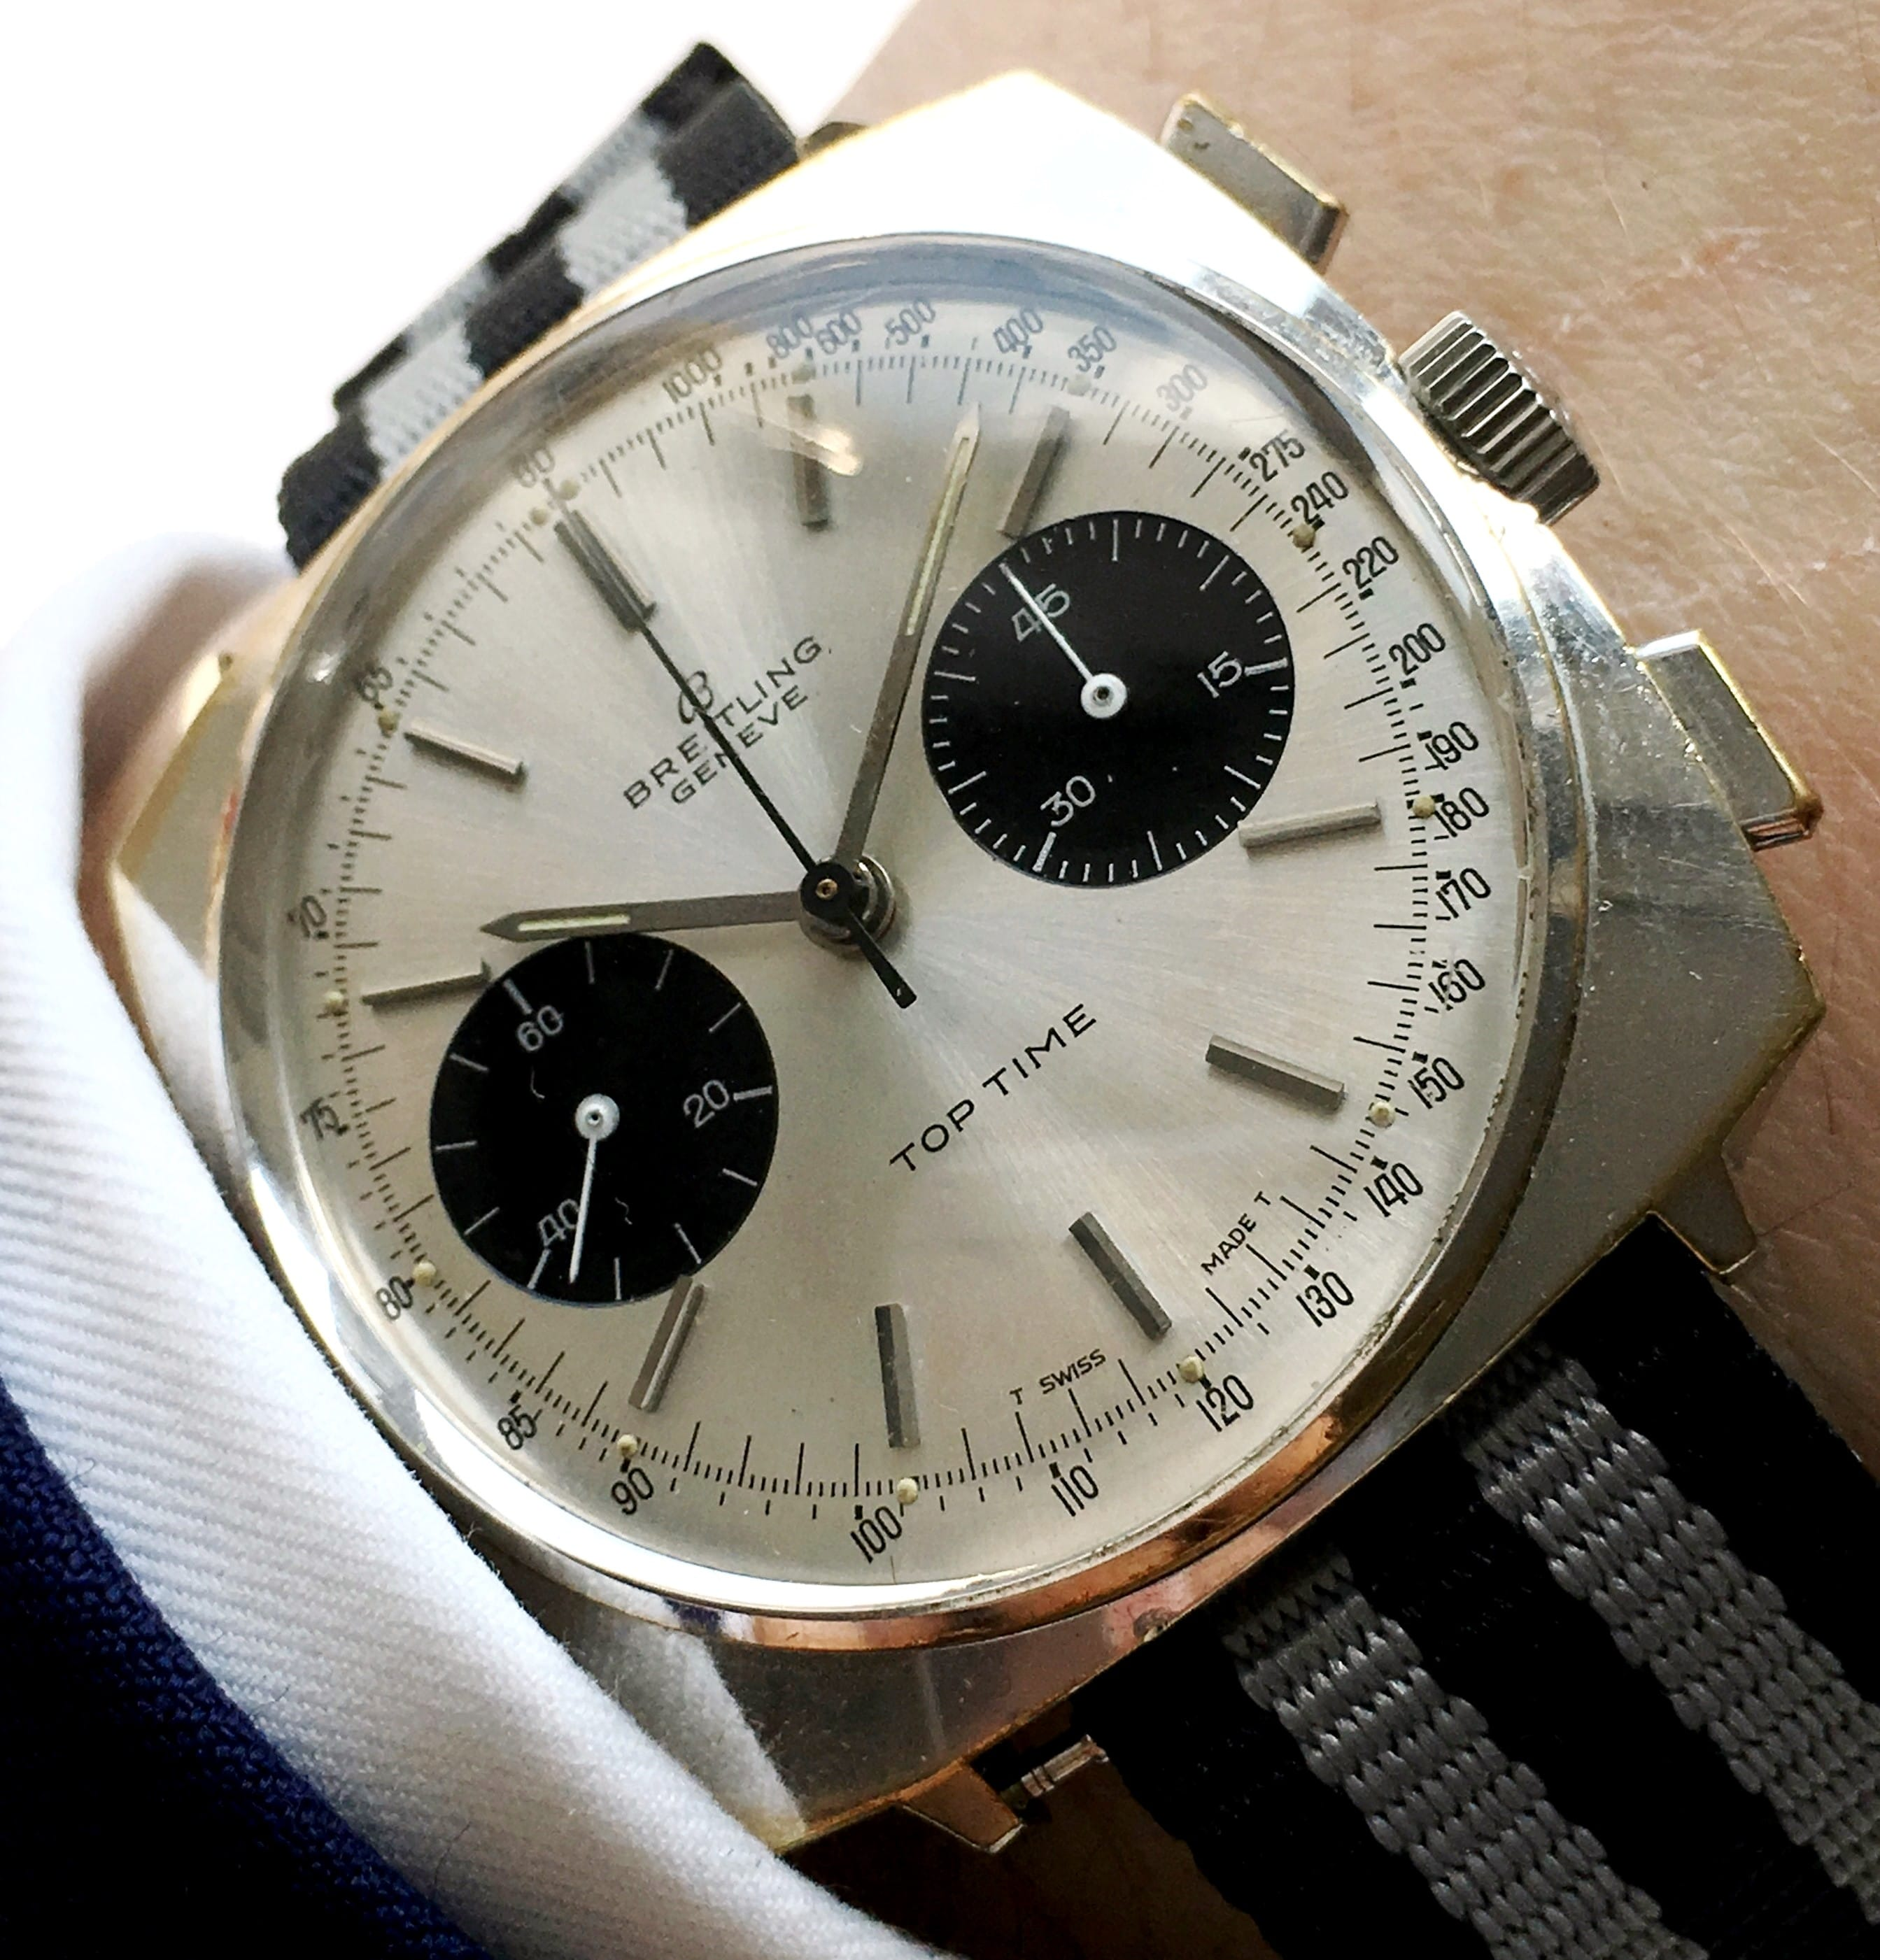 Beautiful Breitling Top Time PANDA Chronograph